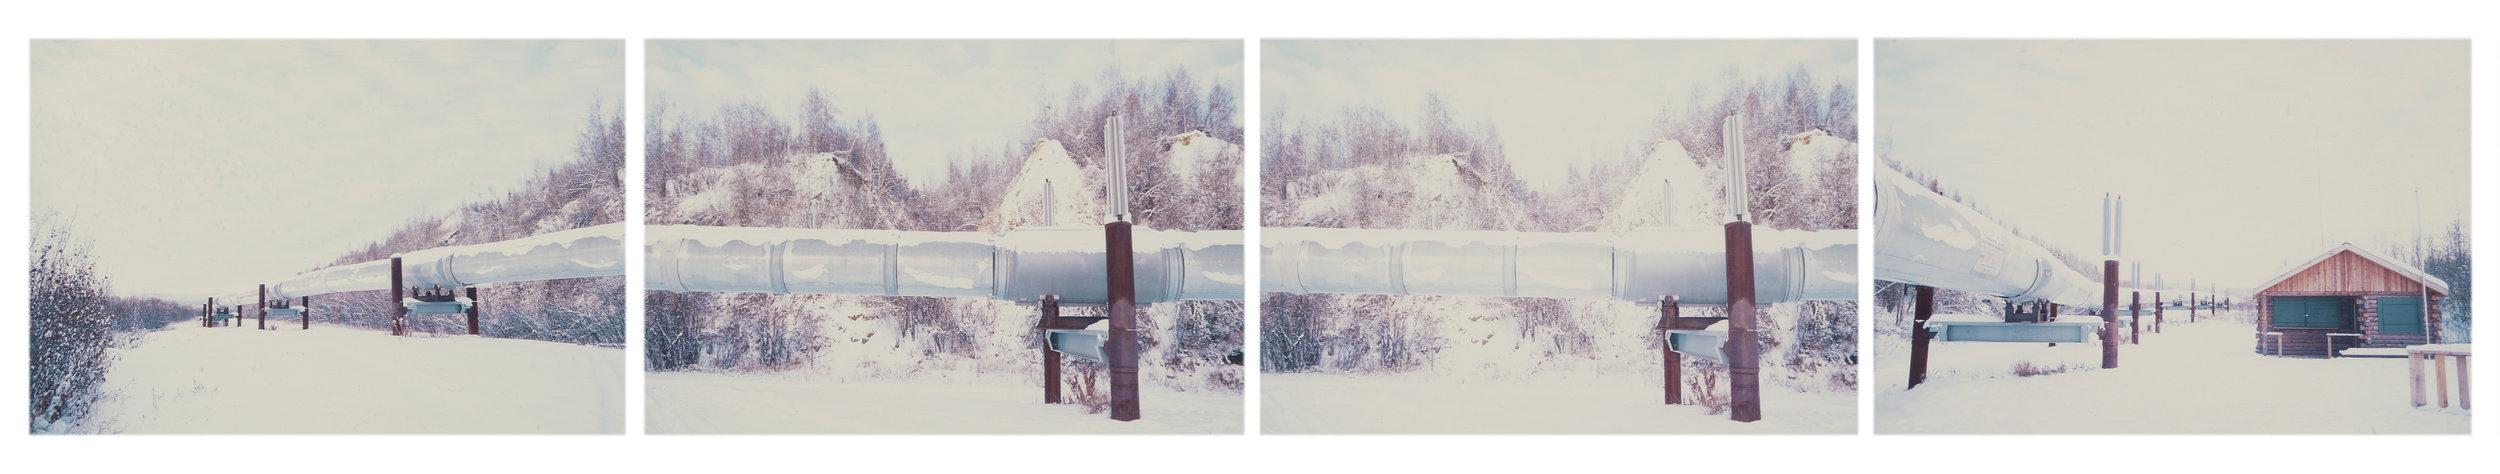 near fairbanks . alaska . 1993